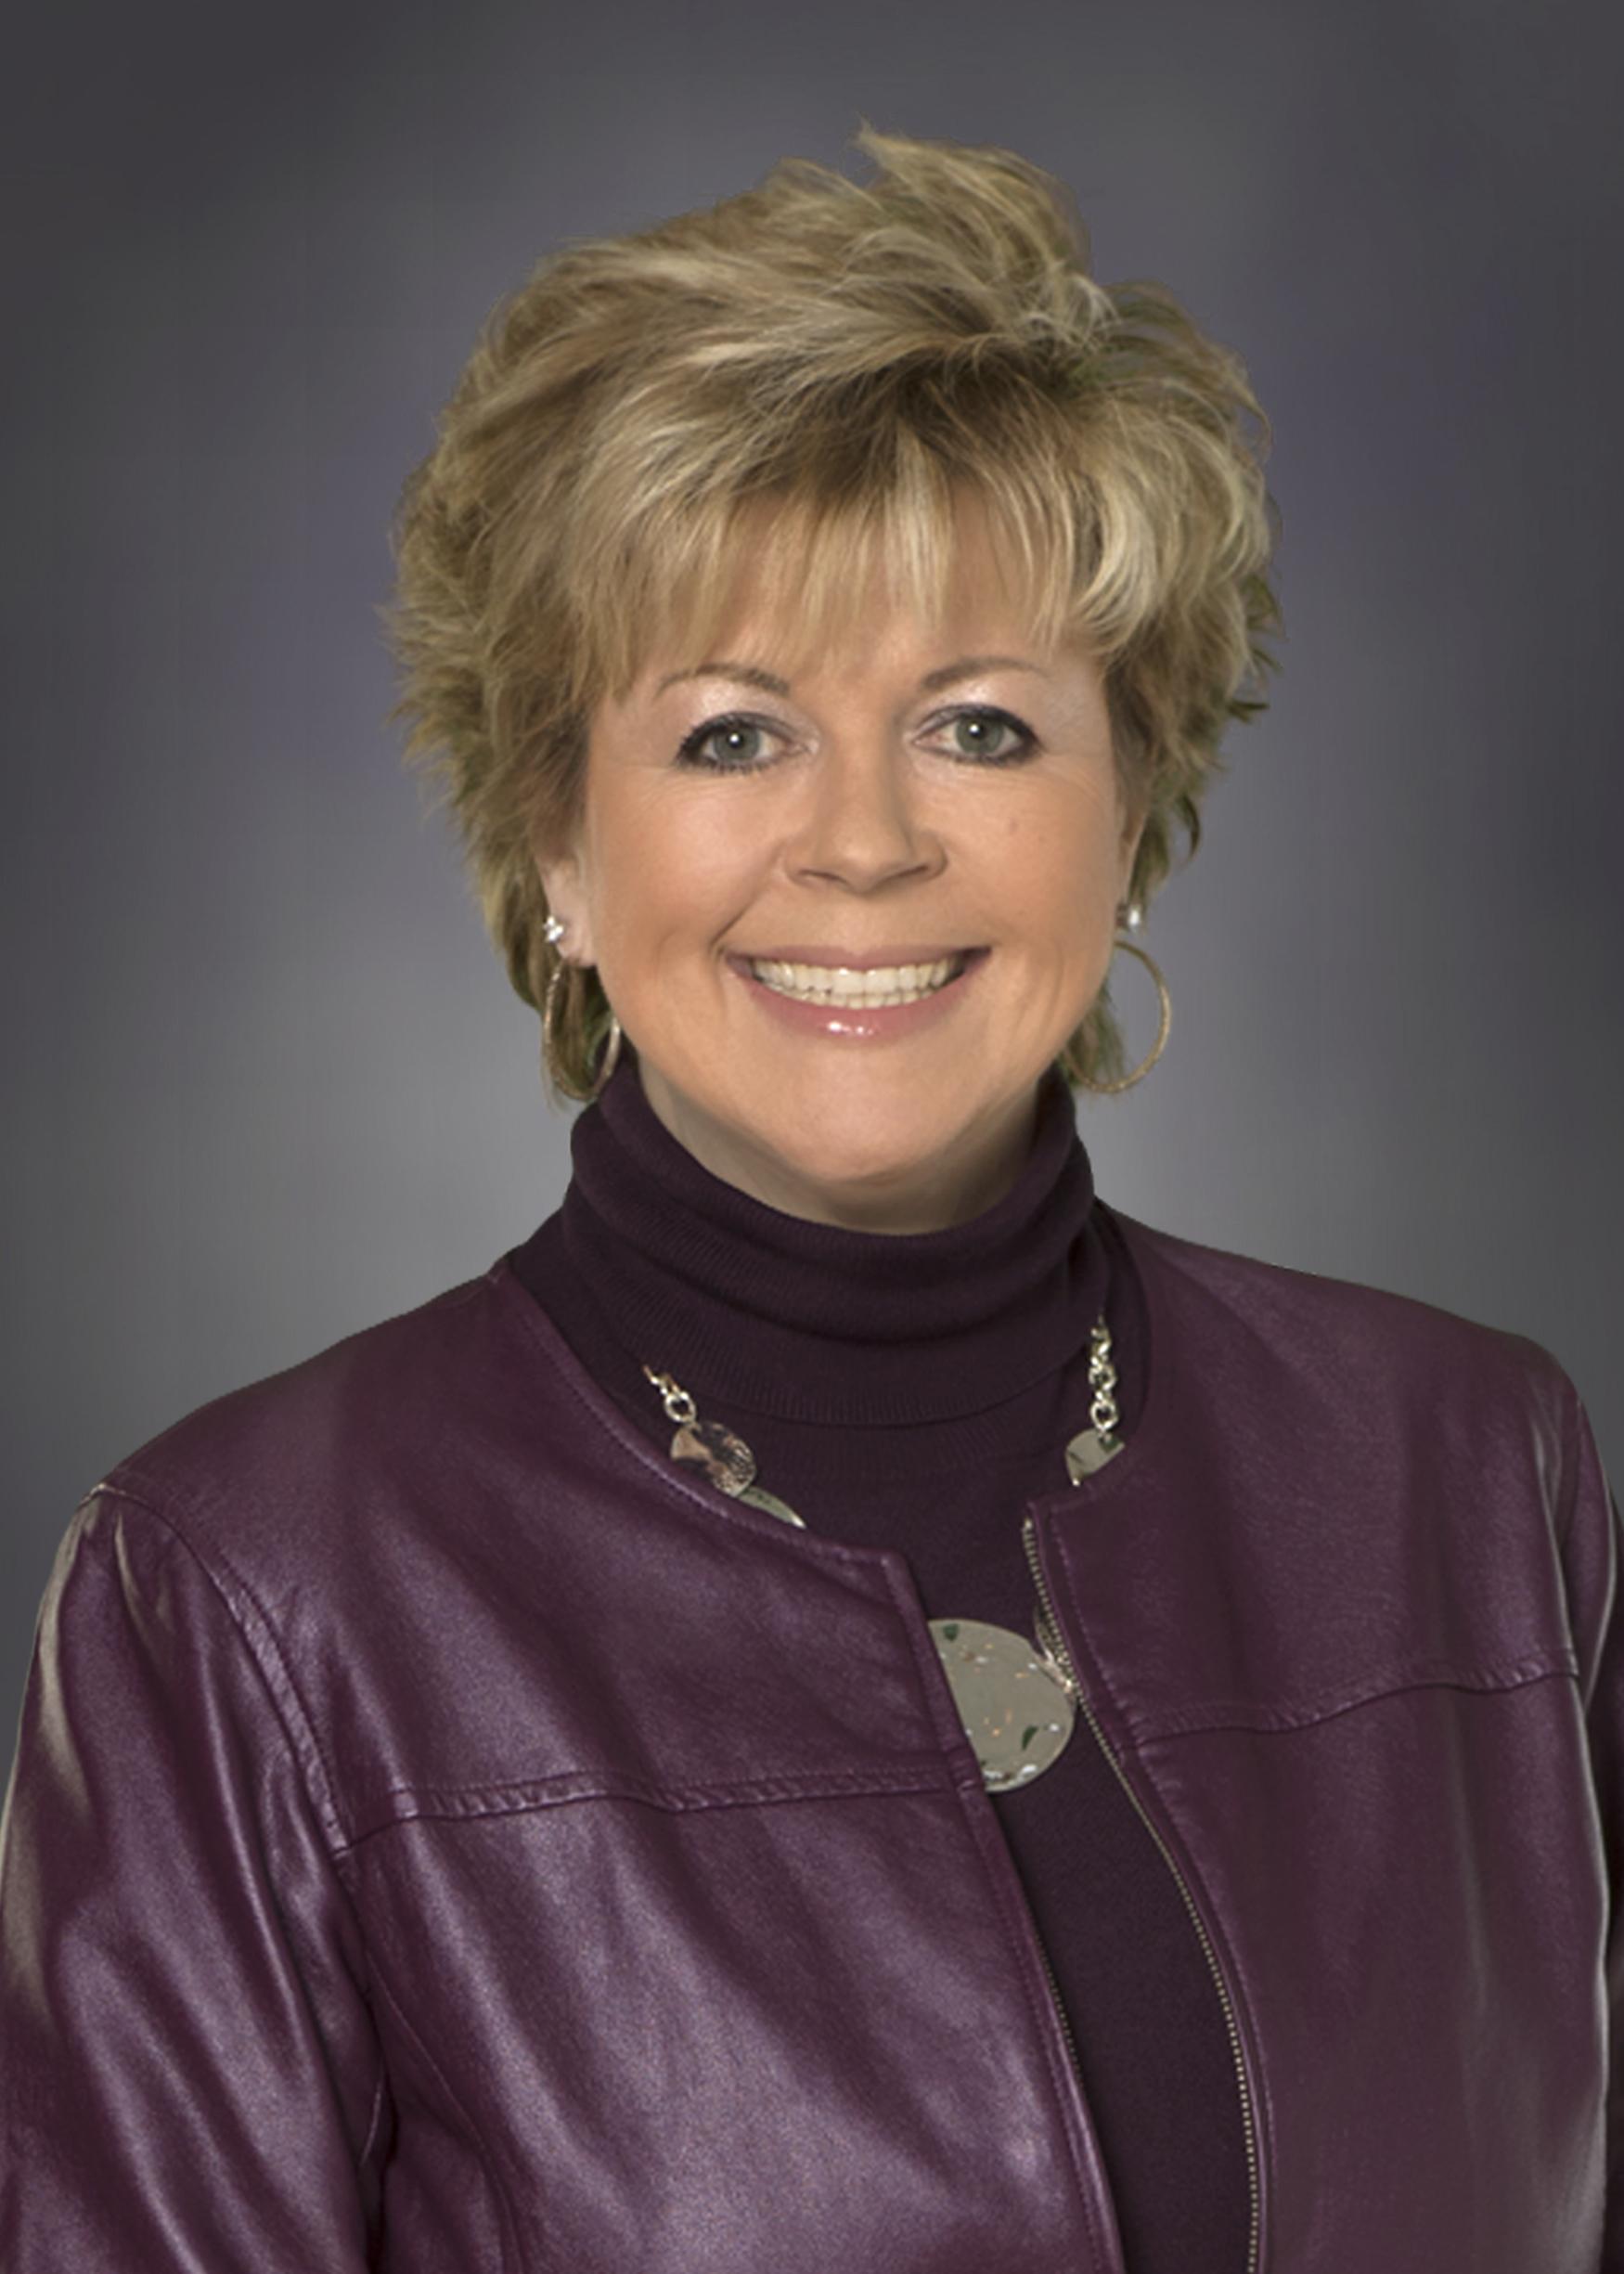 Cynthia Donahoe